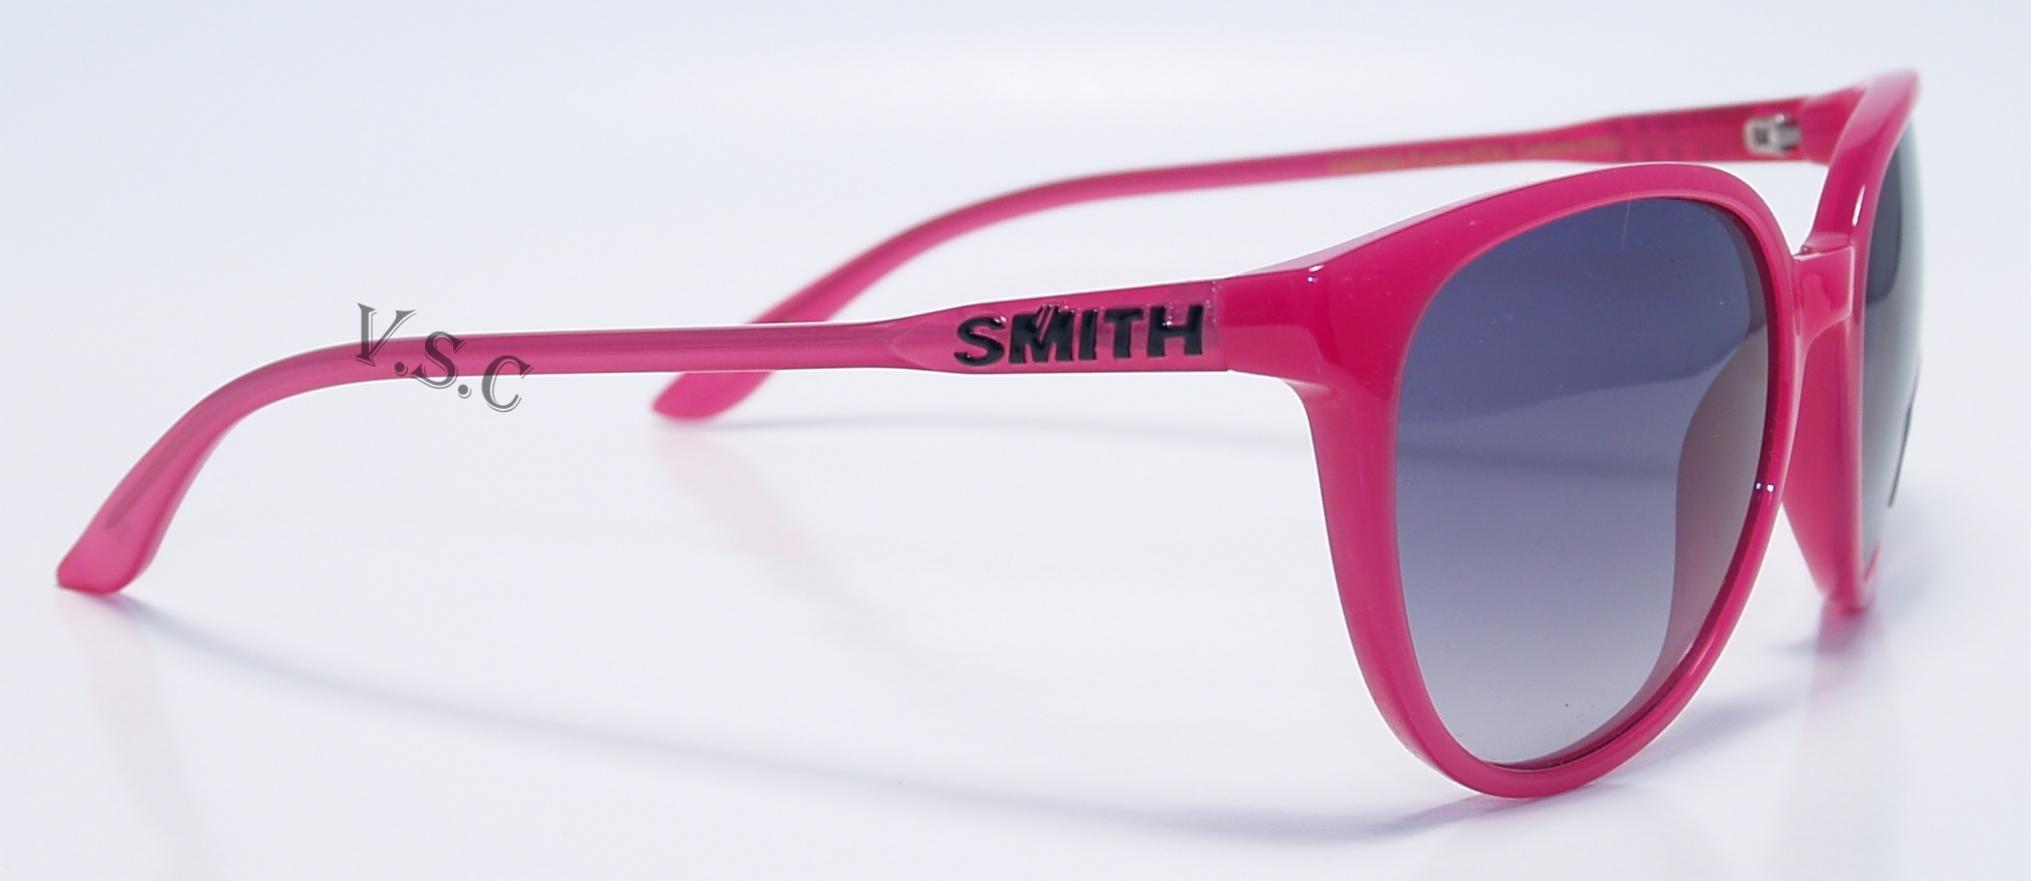 d97ba0cbe11 Smith Optics Cheetah Sunglasses